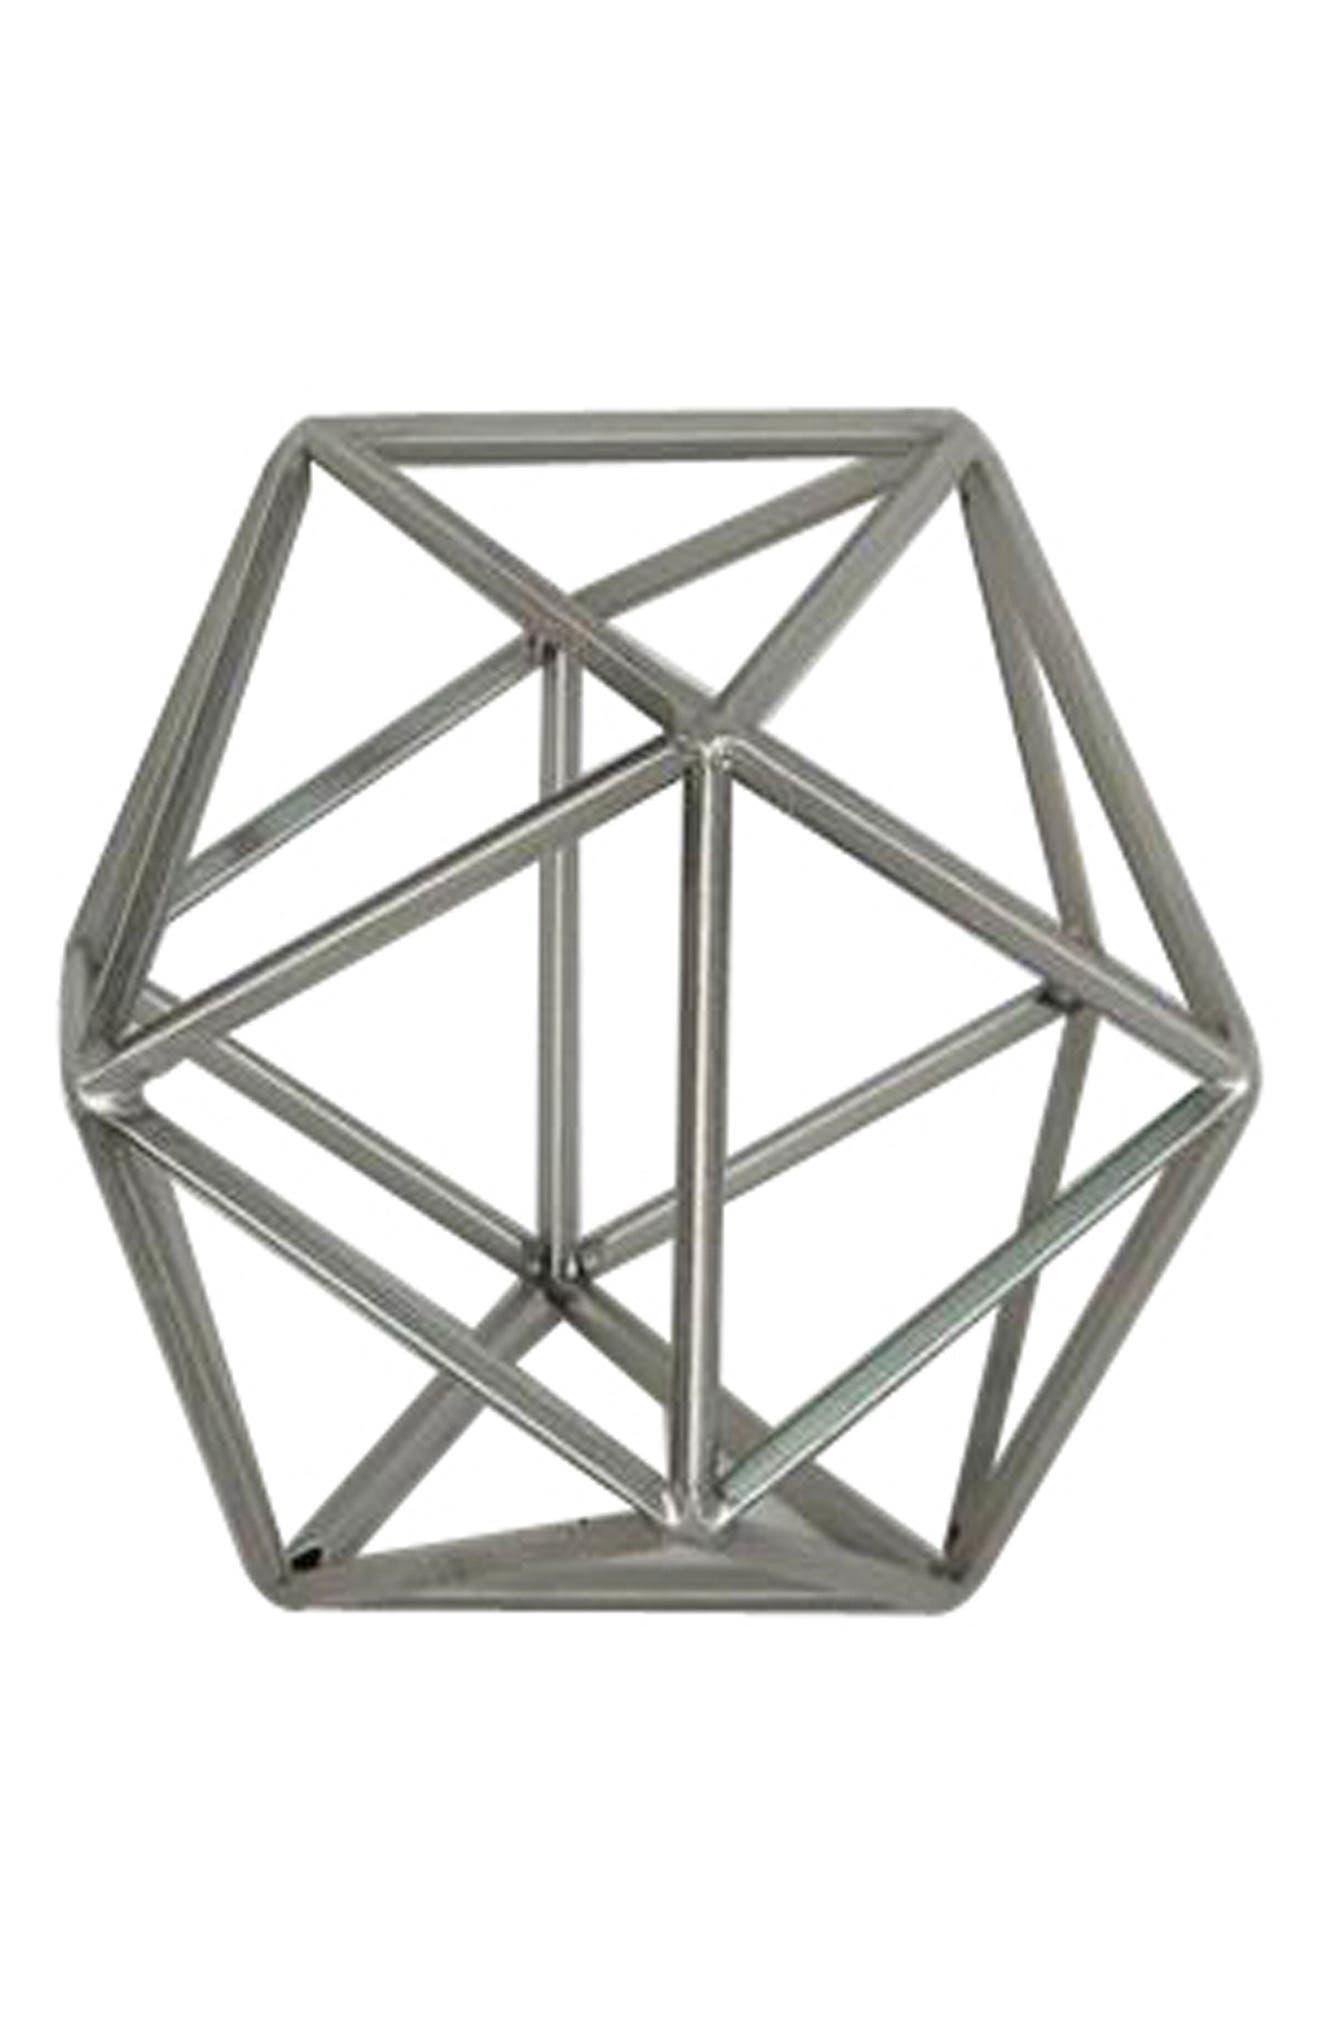 Crystal Art Gallery Wire Sculpture